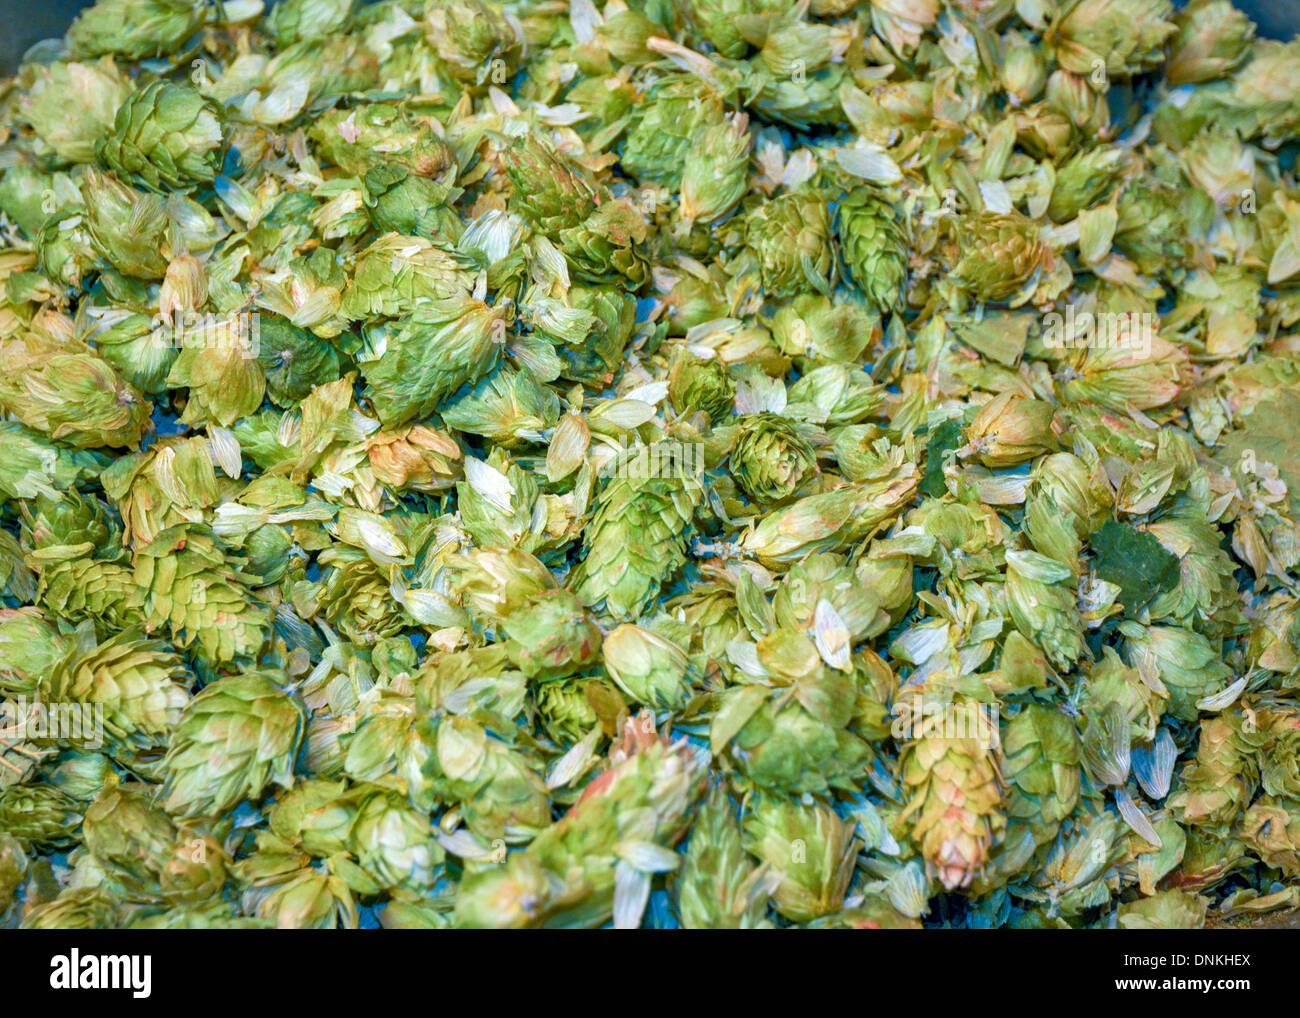 Ingredient for making beer hops - Stock Image